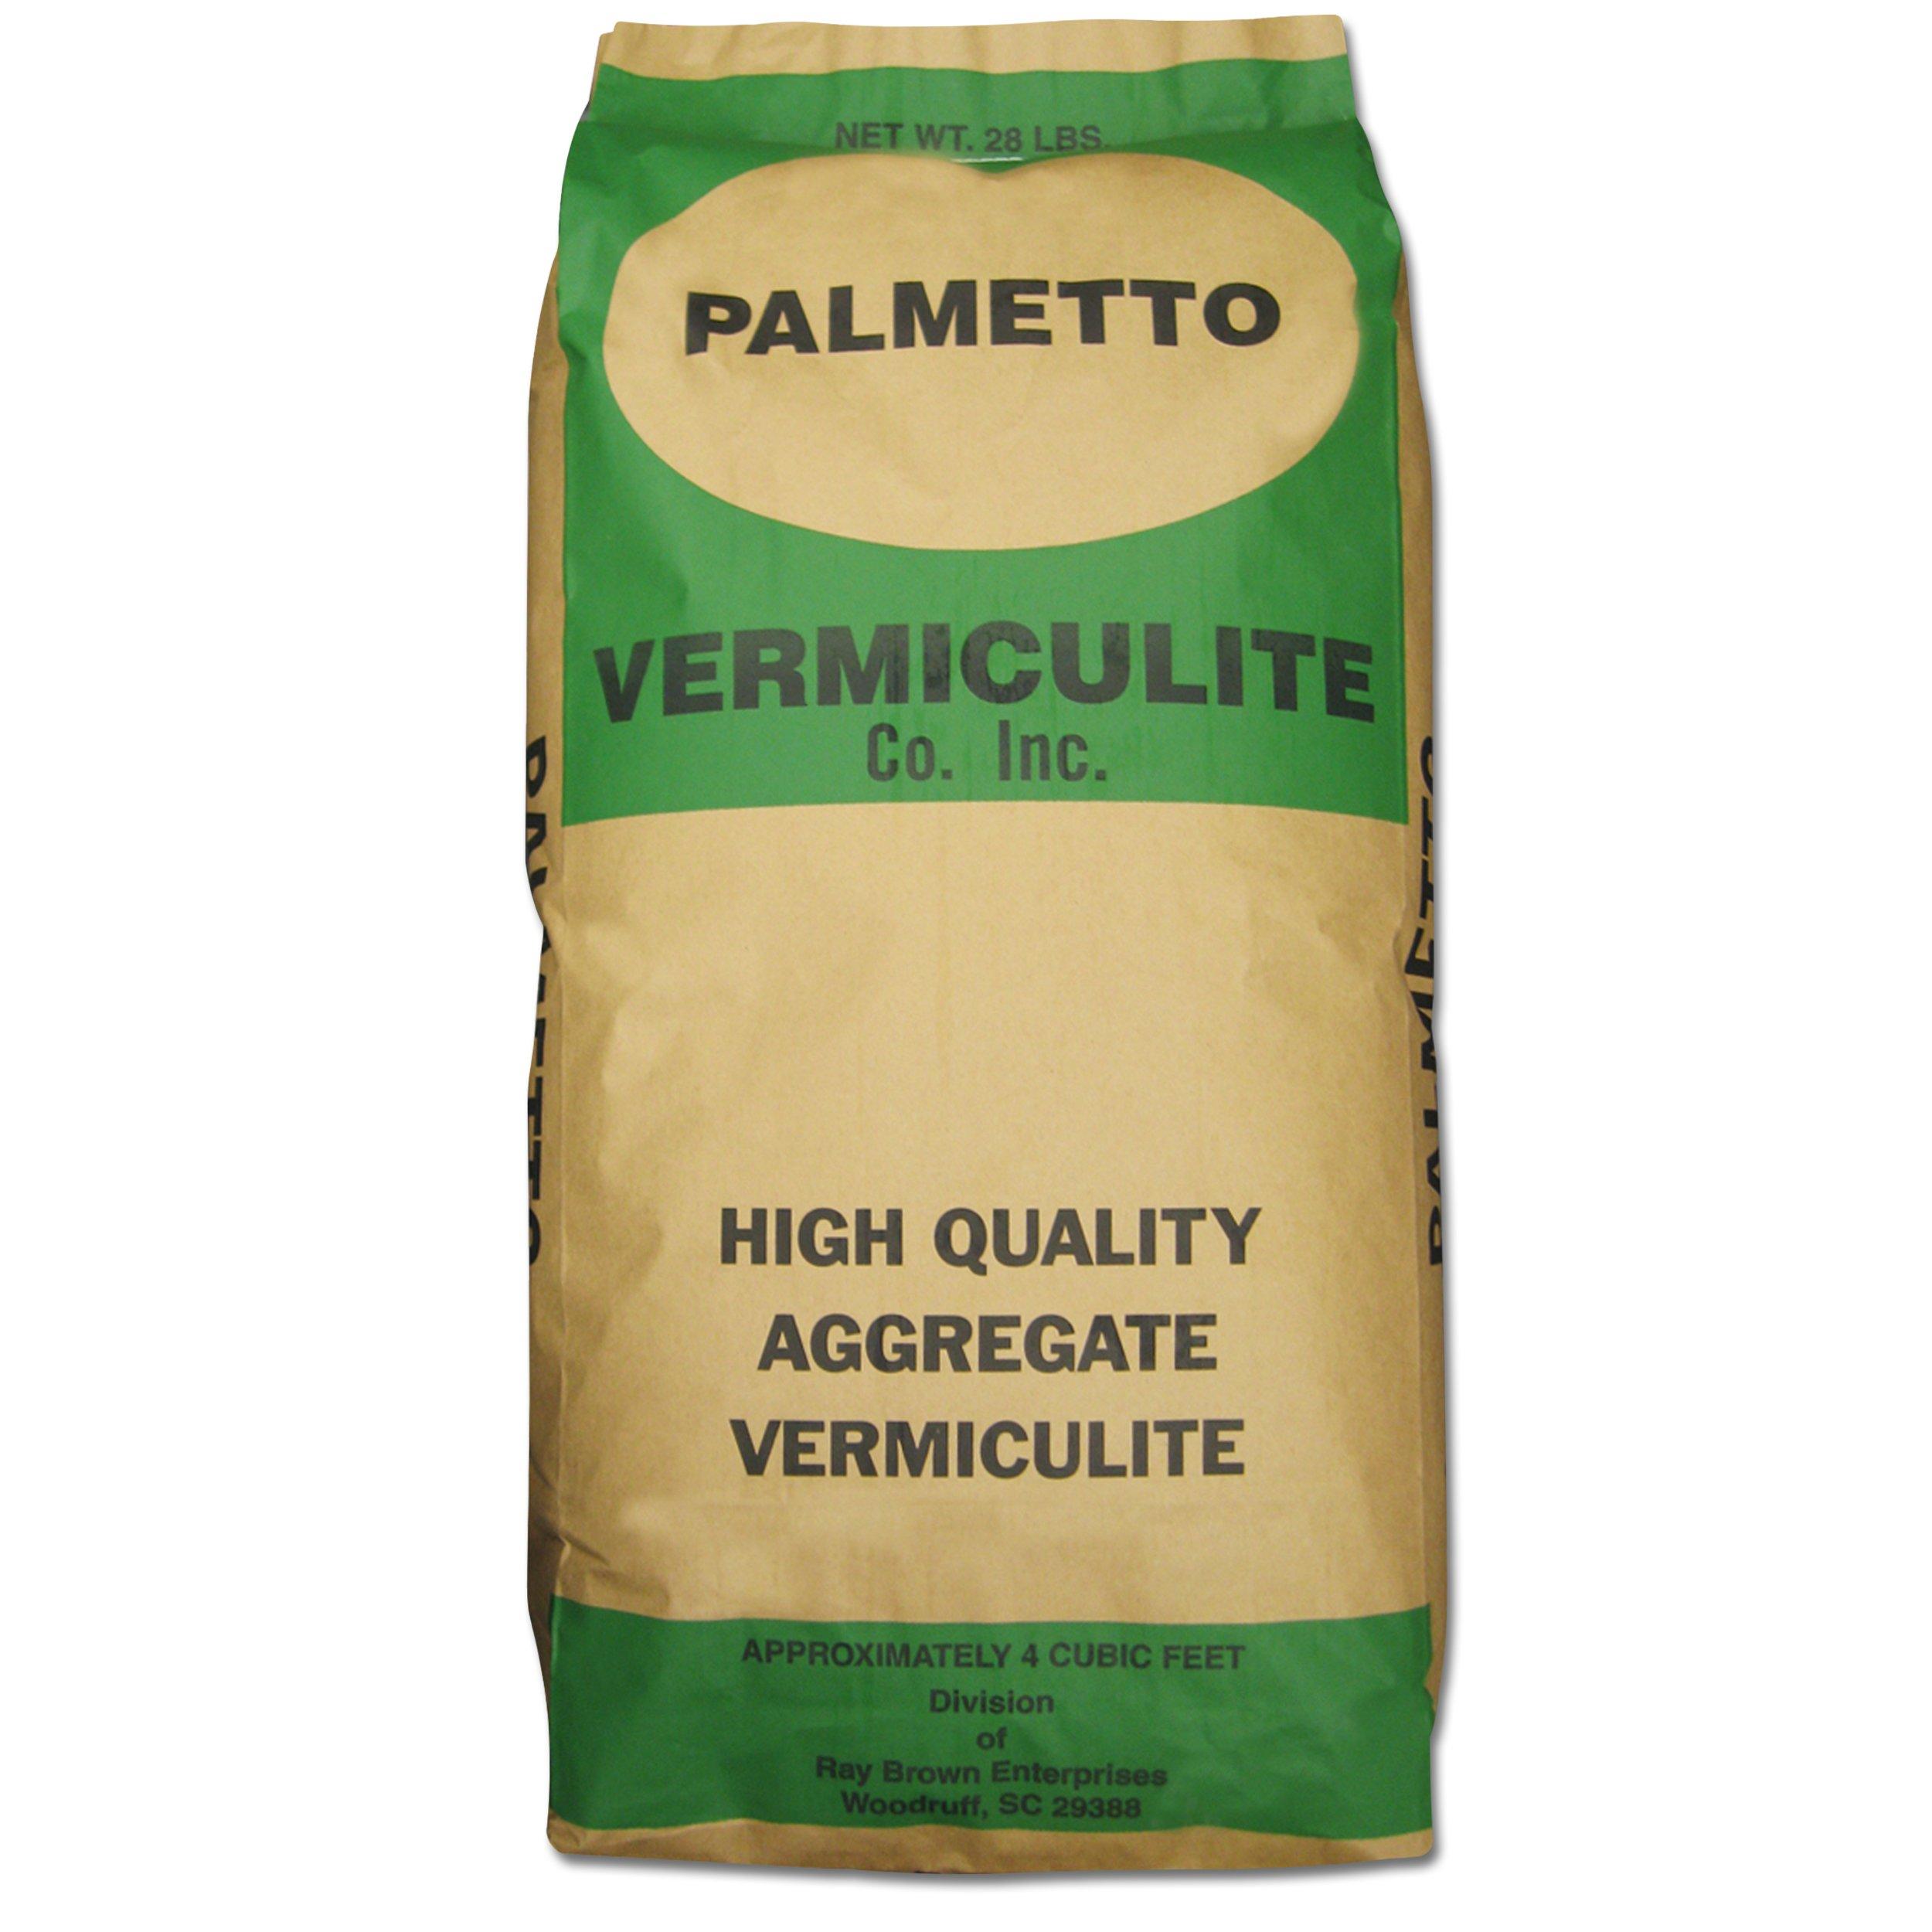 Palmetto Medium Grade C-3 Swimming Pool Vermiculite - 25 Pounds by Palmetto Vermiculite Company